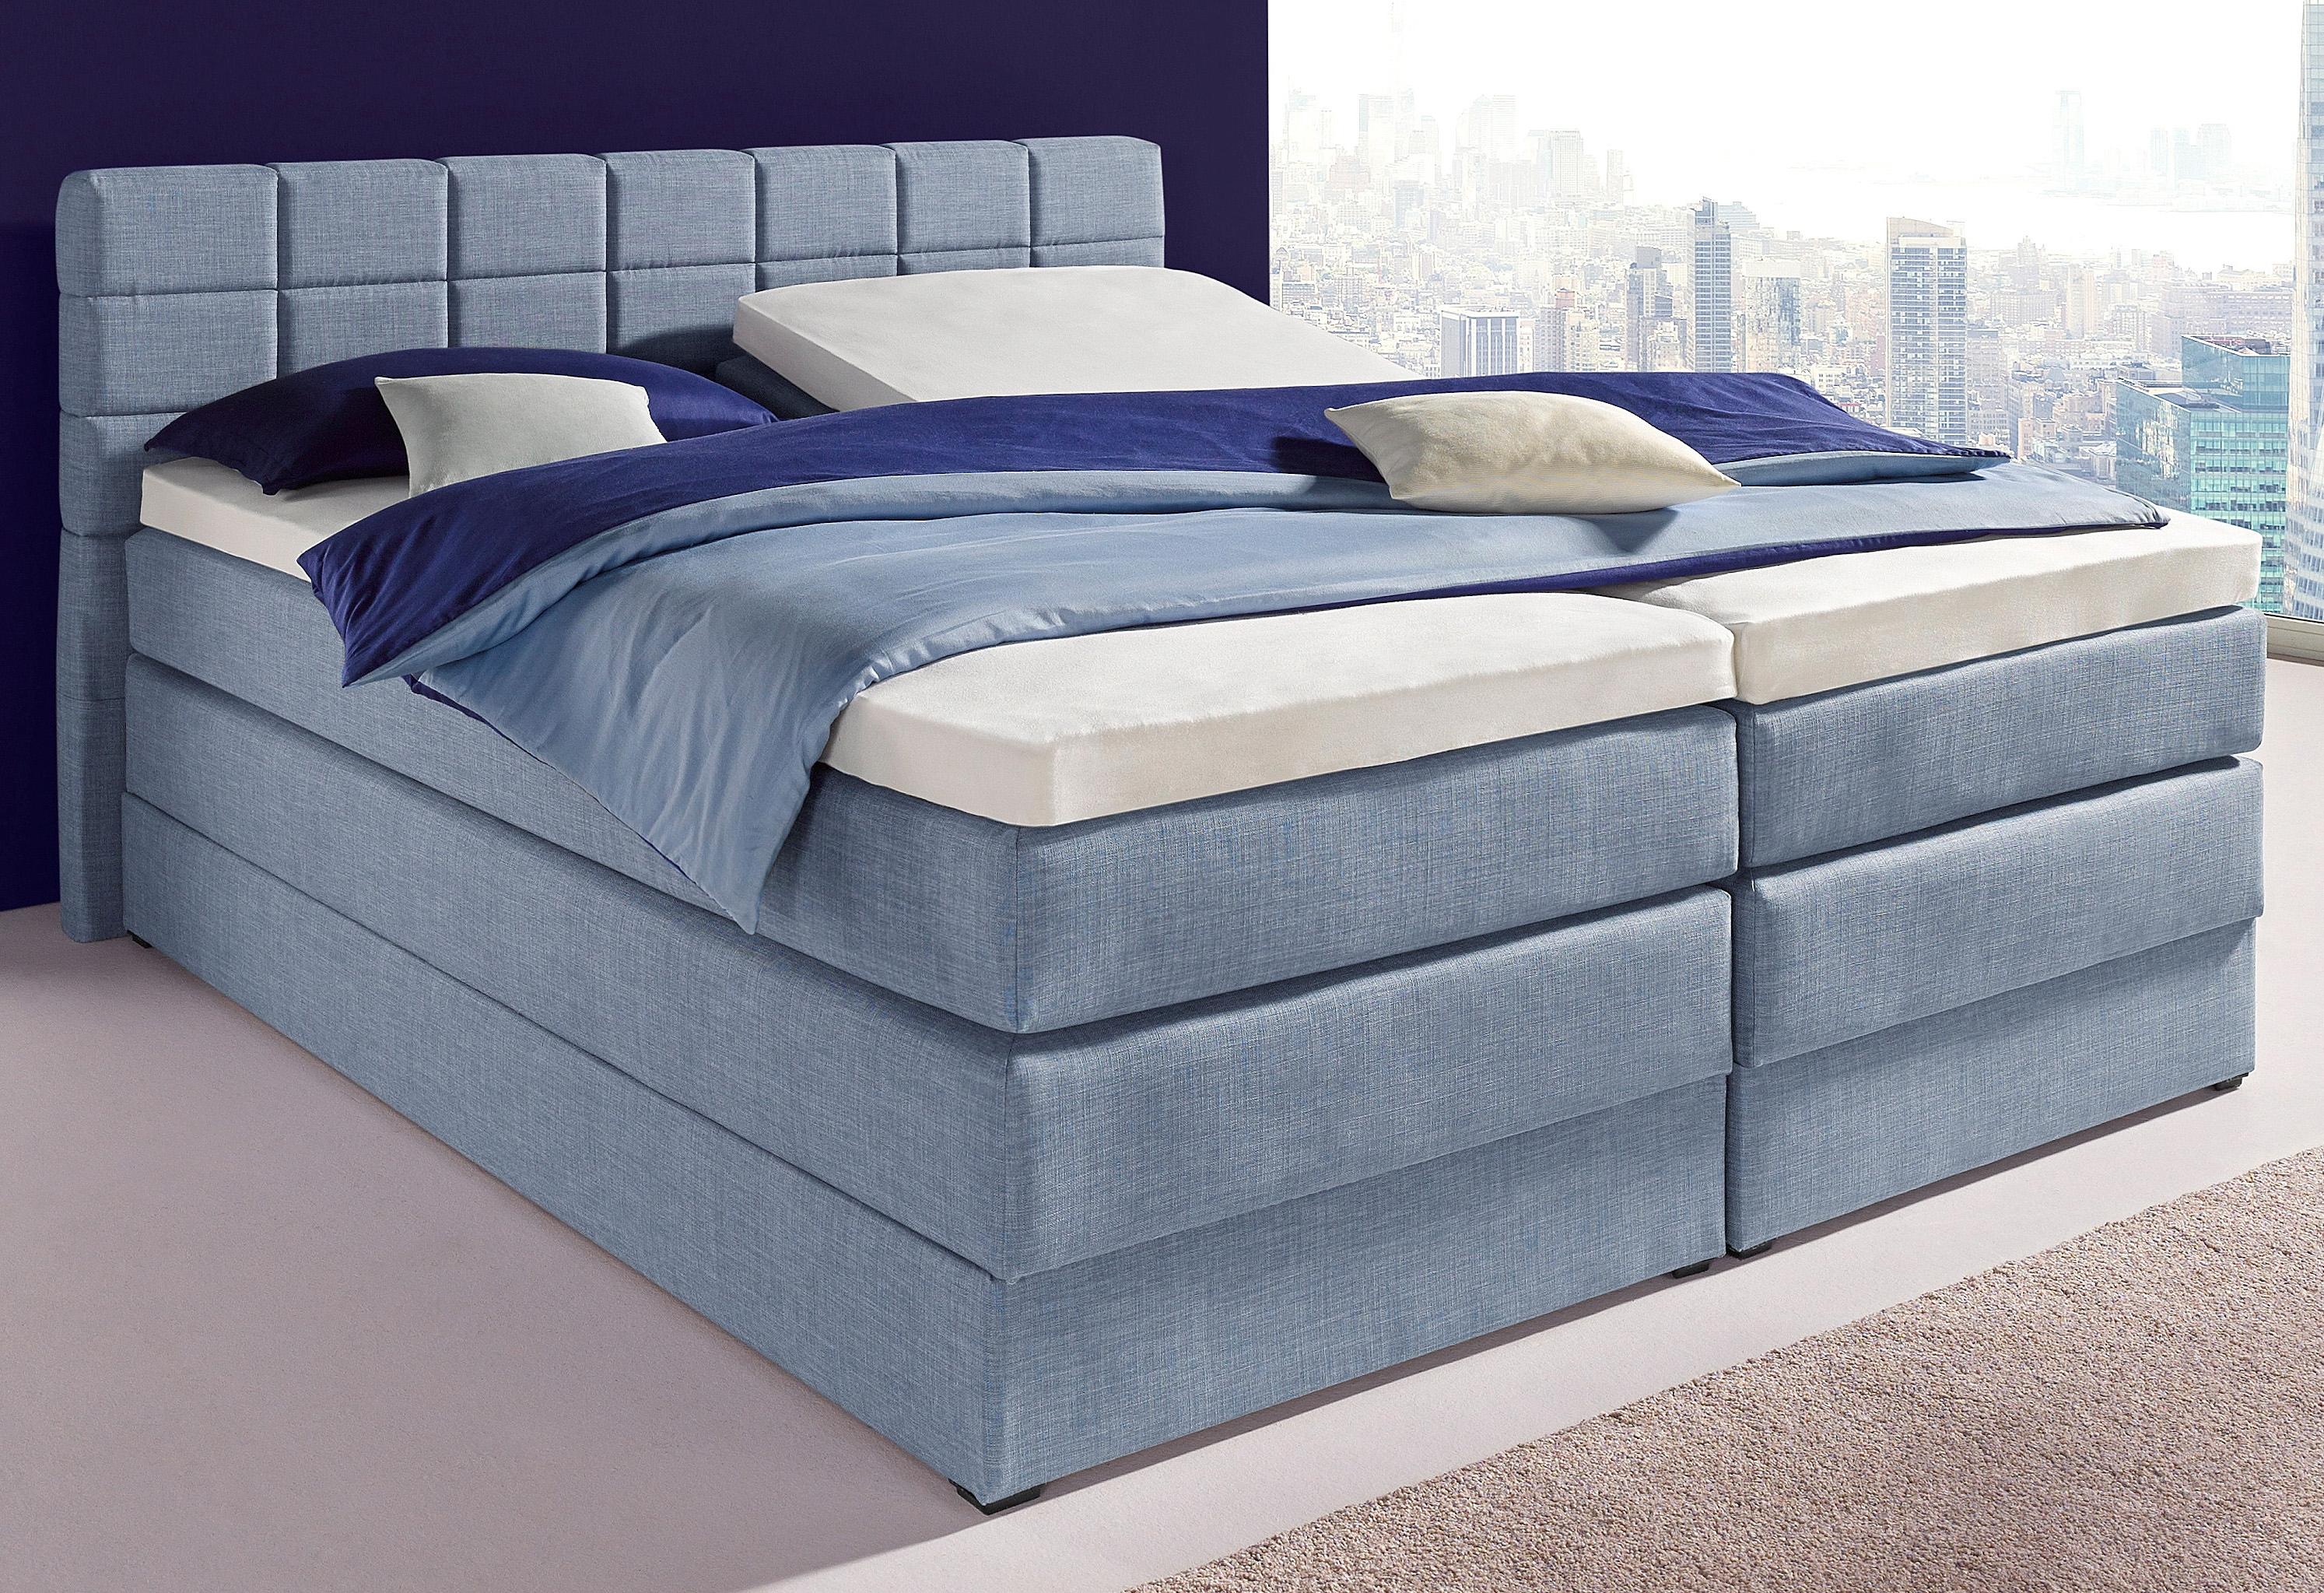 topmatras matrasdek online shop otto. Black Bedroom Furniture Sets. Home Design Ideas